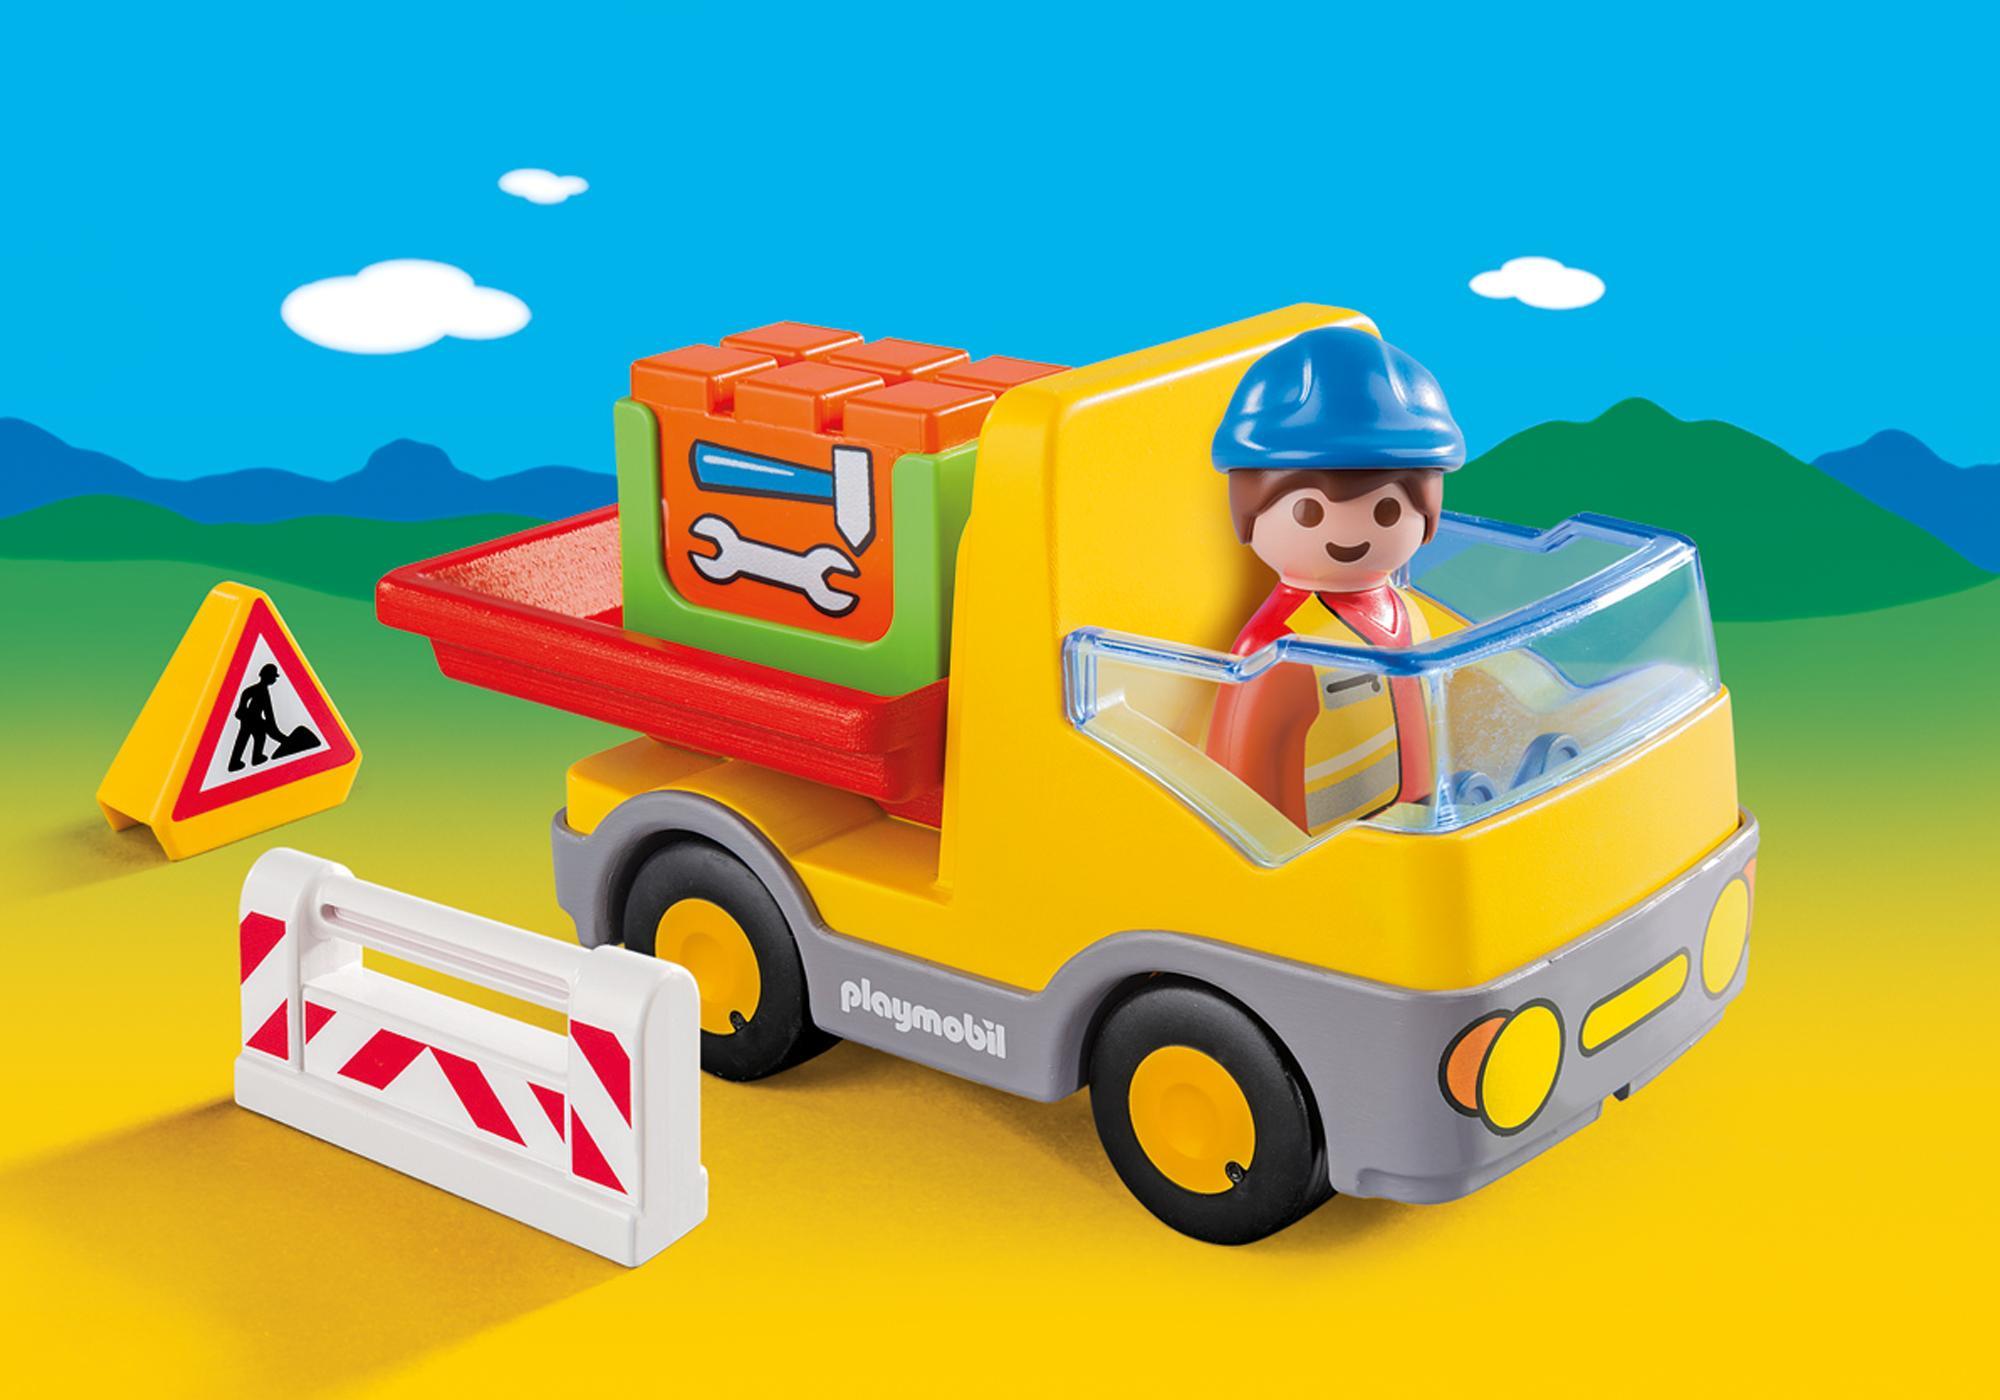 http://media.playmobil.com/i/playmobil/6960_product_detail/1.2.3 Camión de Construcción